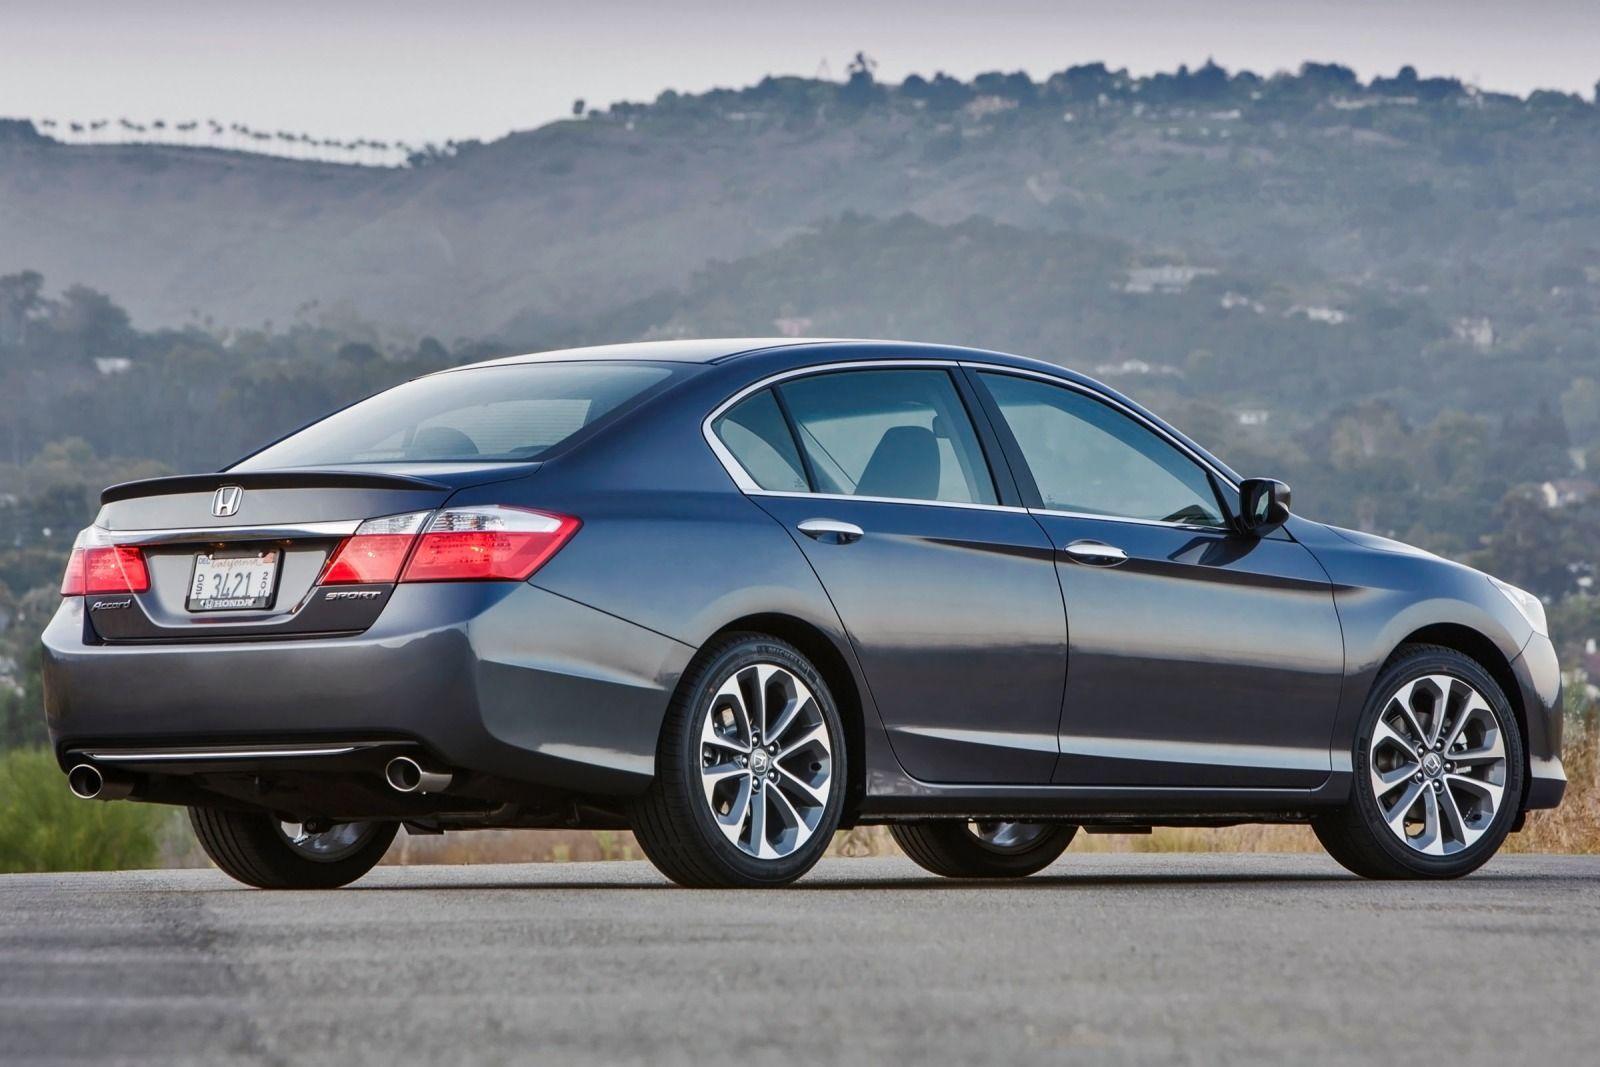 2015 Honda Accord Wide HD Wallpaper (Dengan gambar